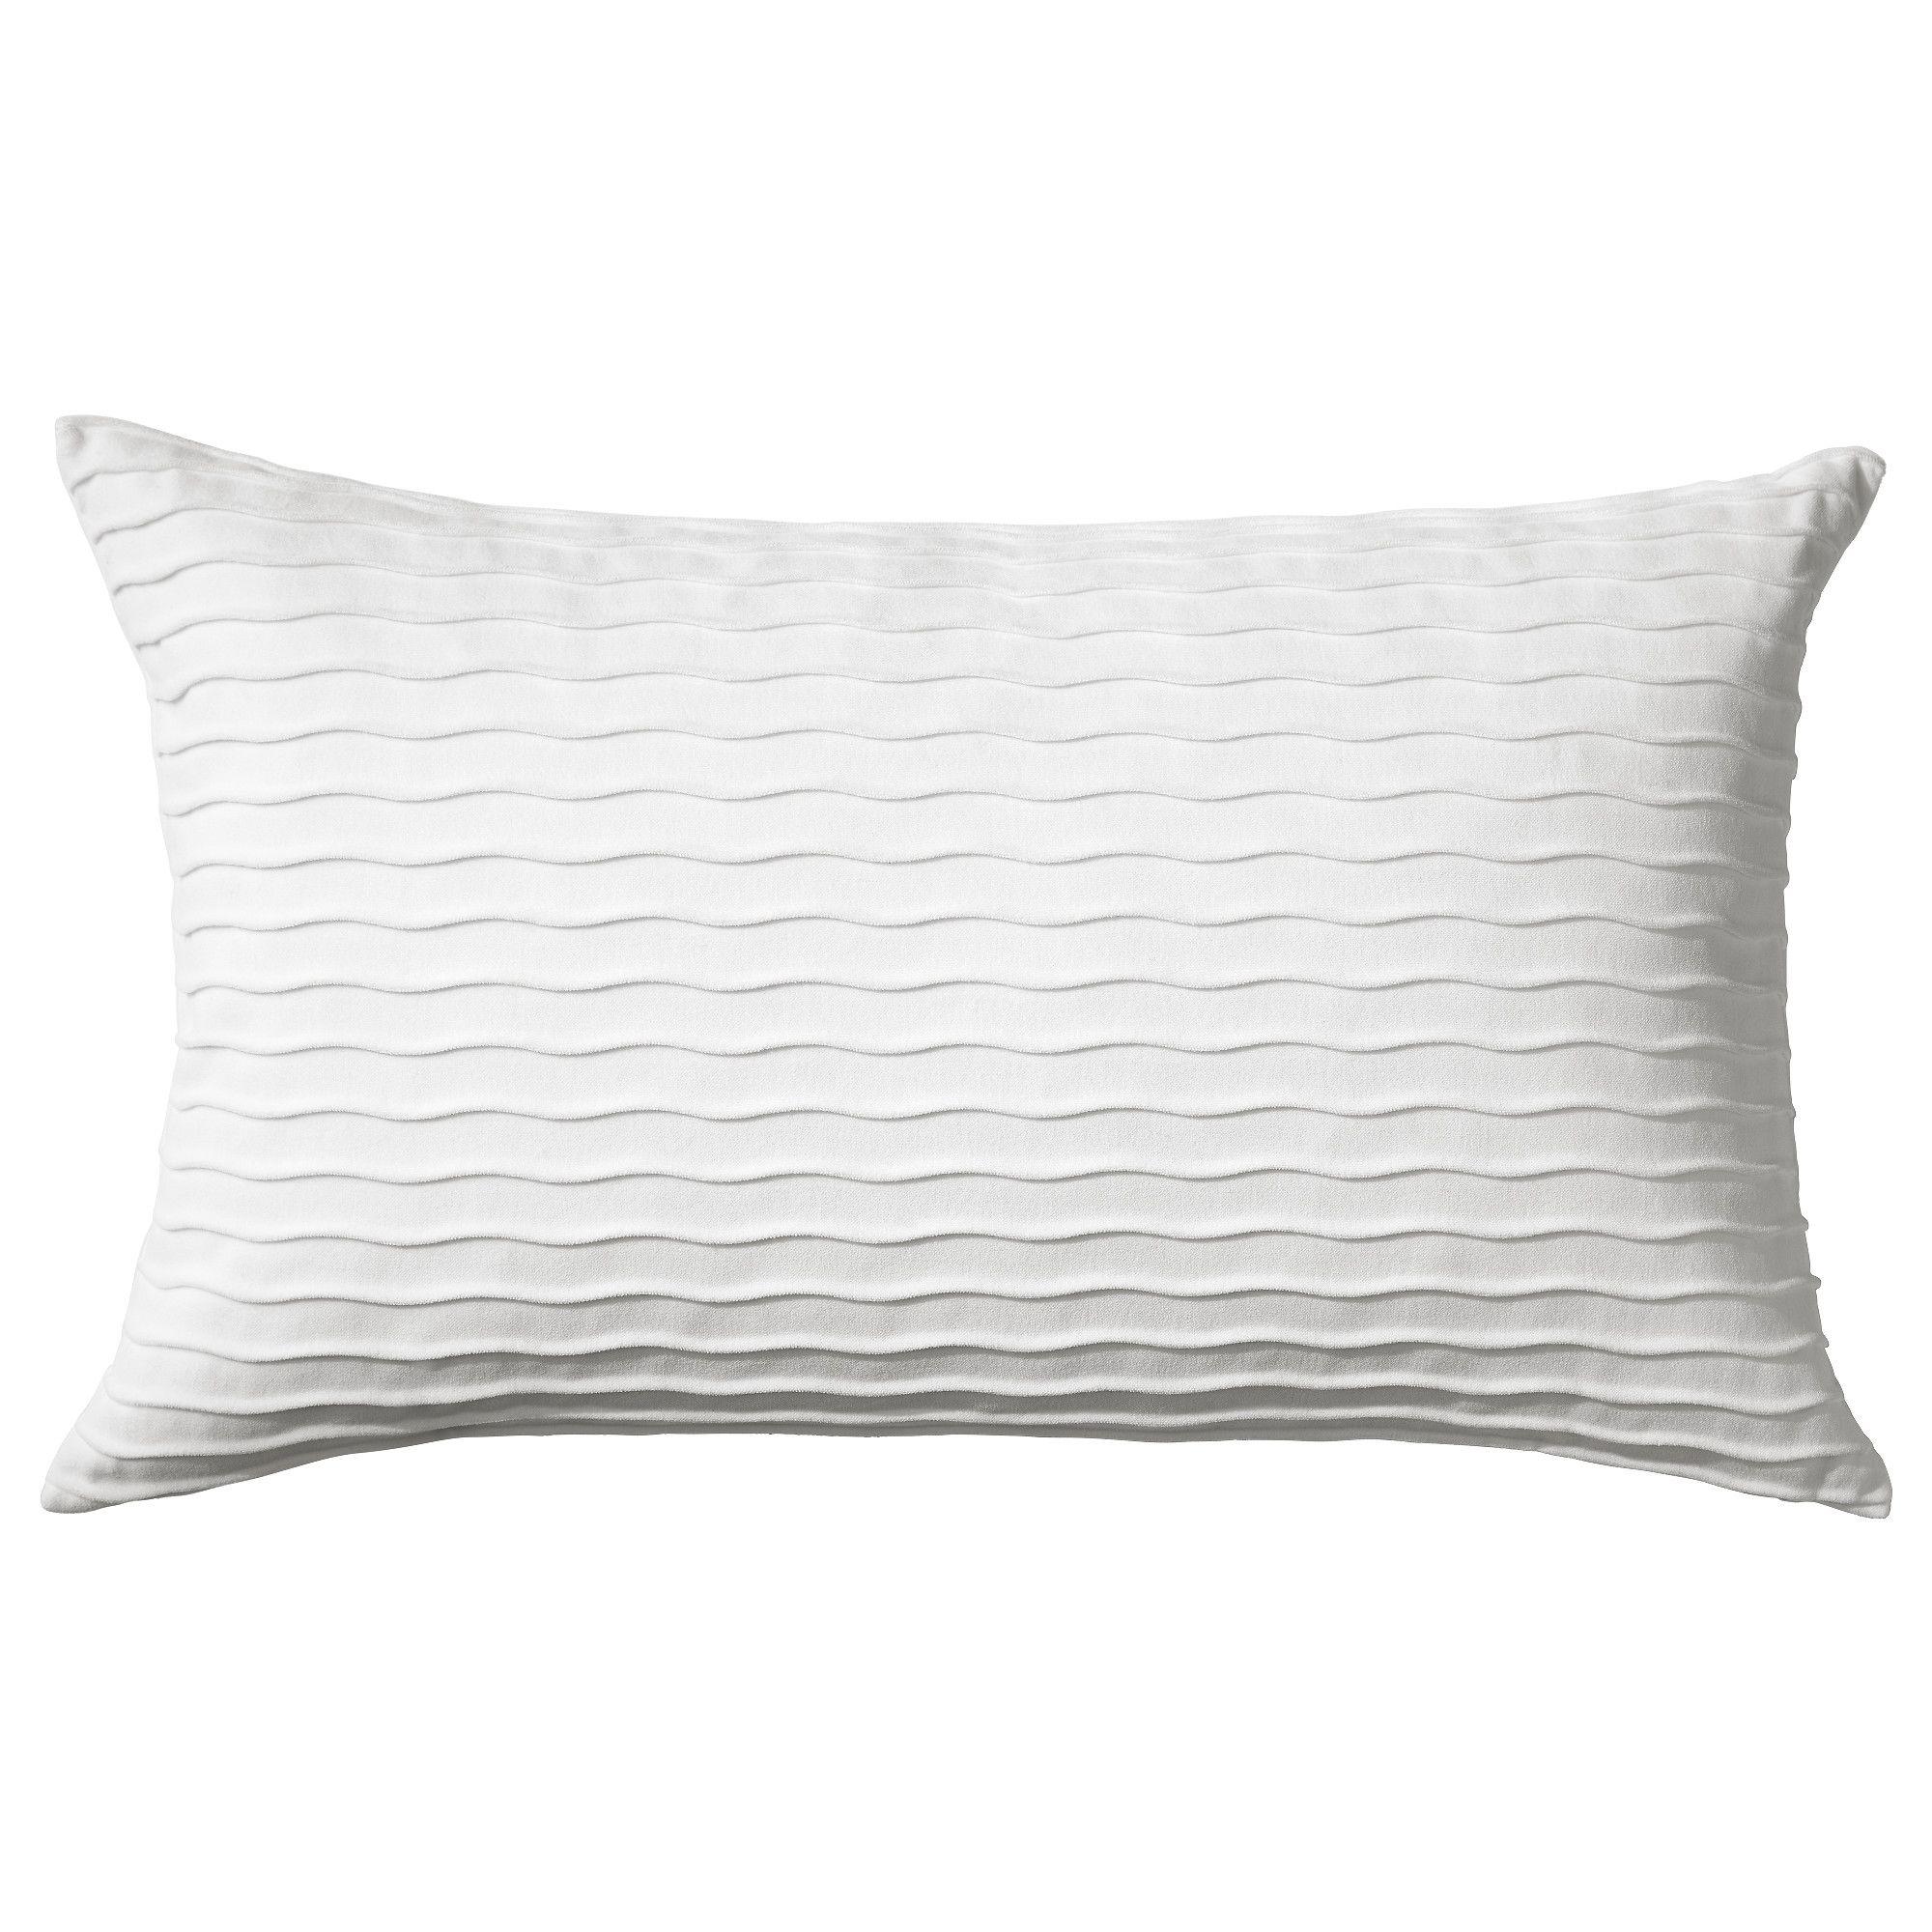 Ikea Vanderot Cushion White Cushions Ikea Cushions Ikea